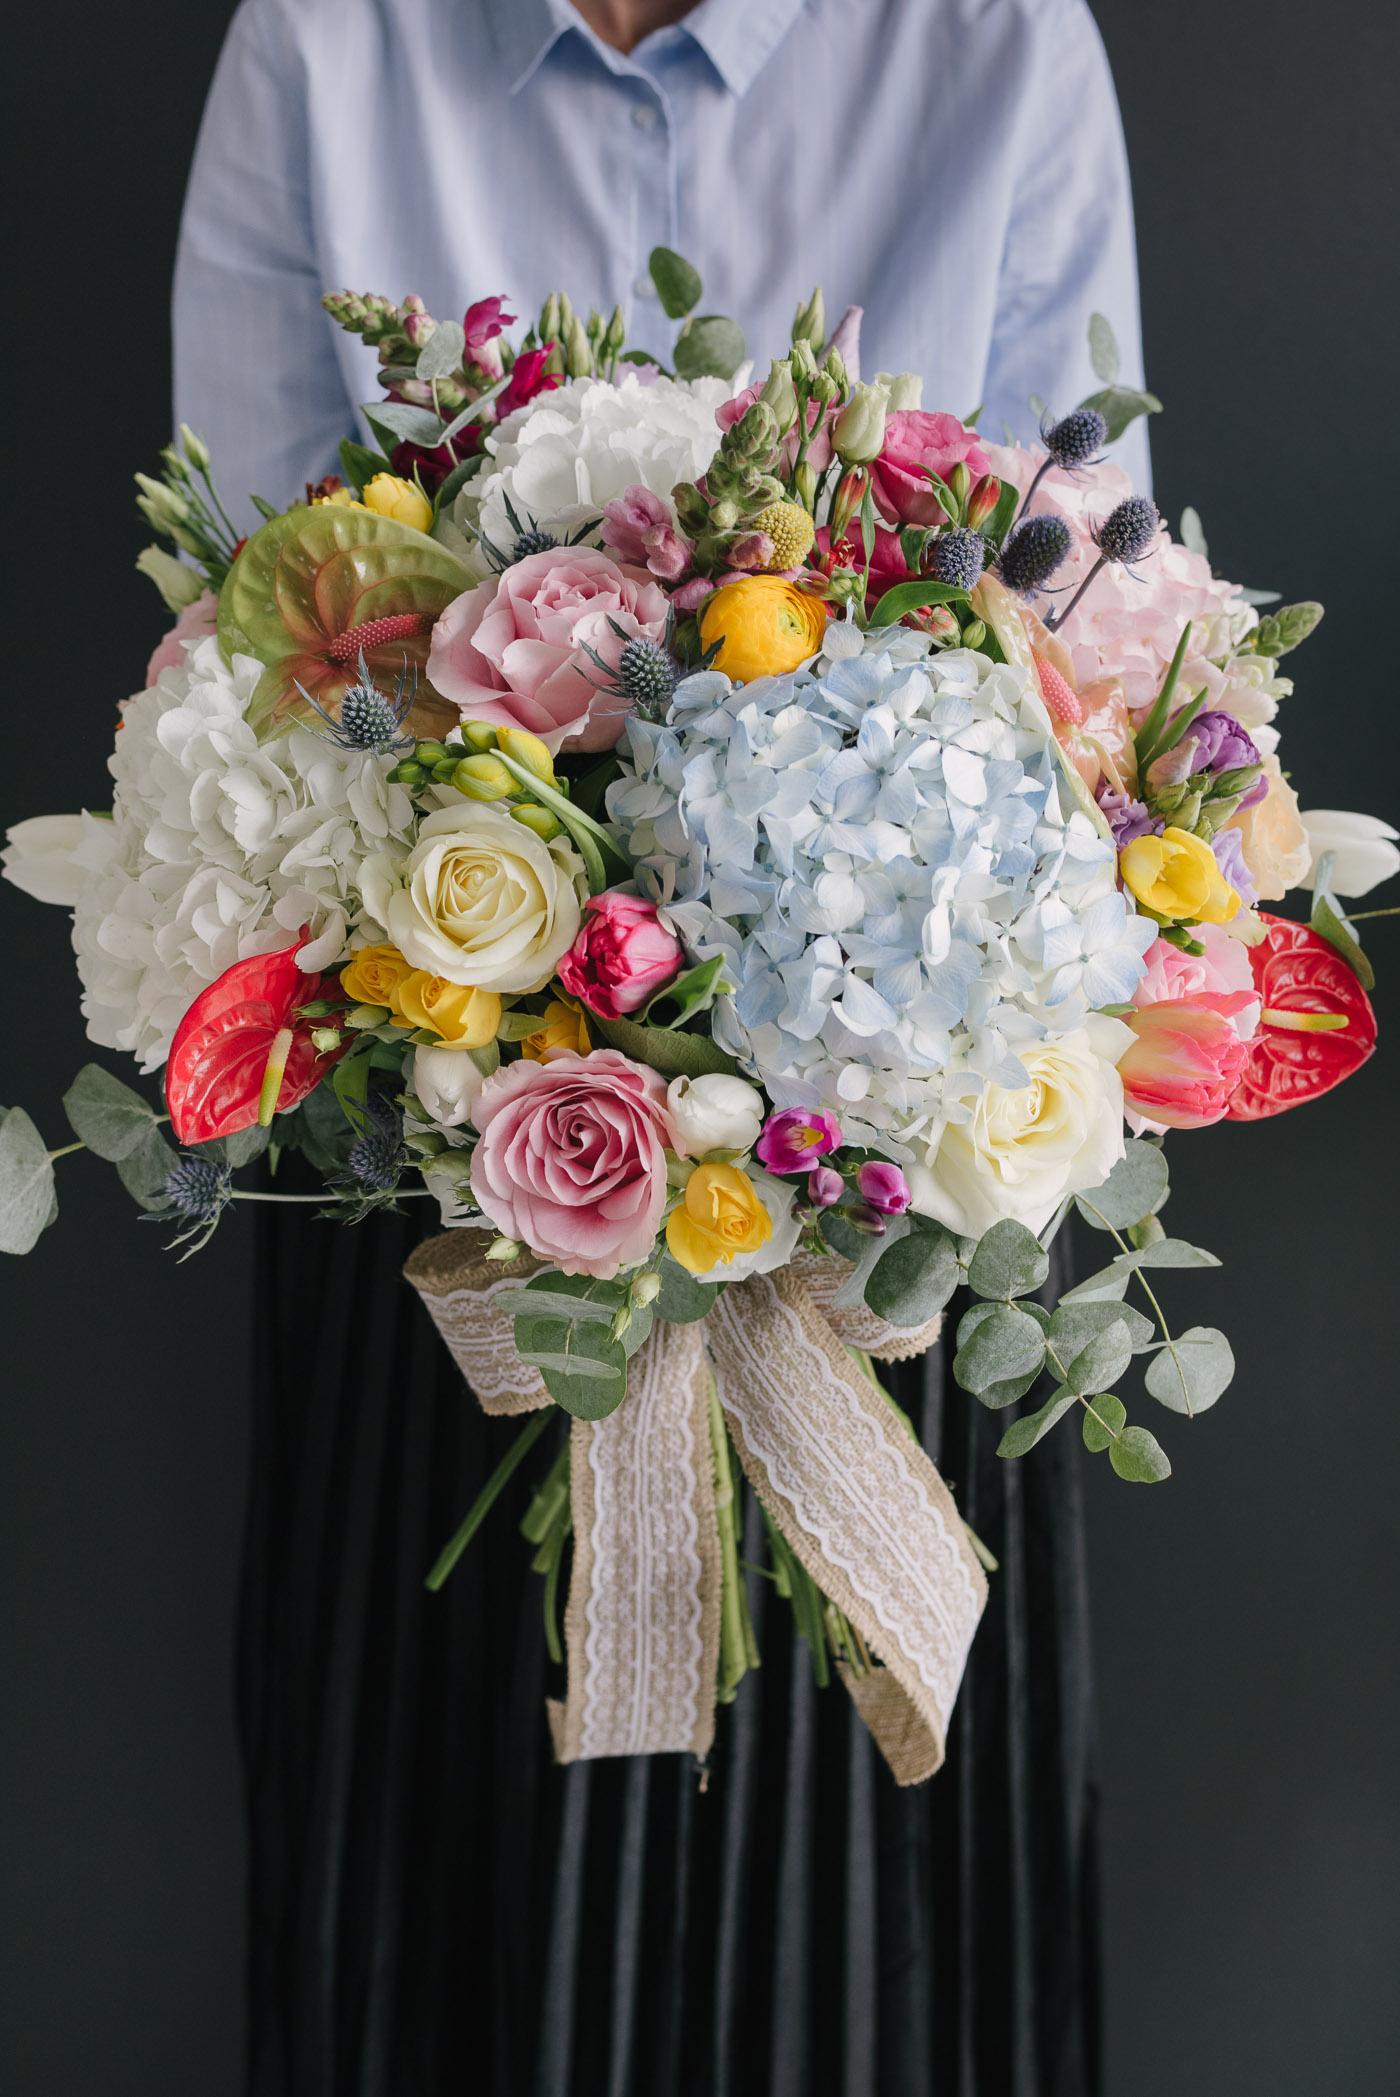 Buchet Urias Cu Flori Colorate-1